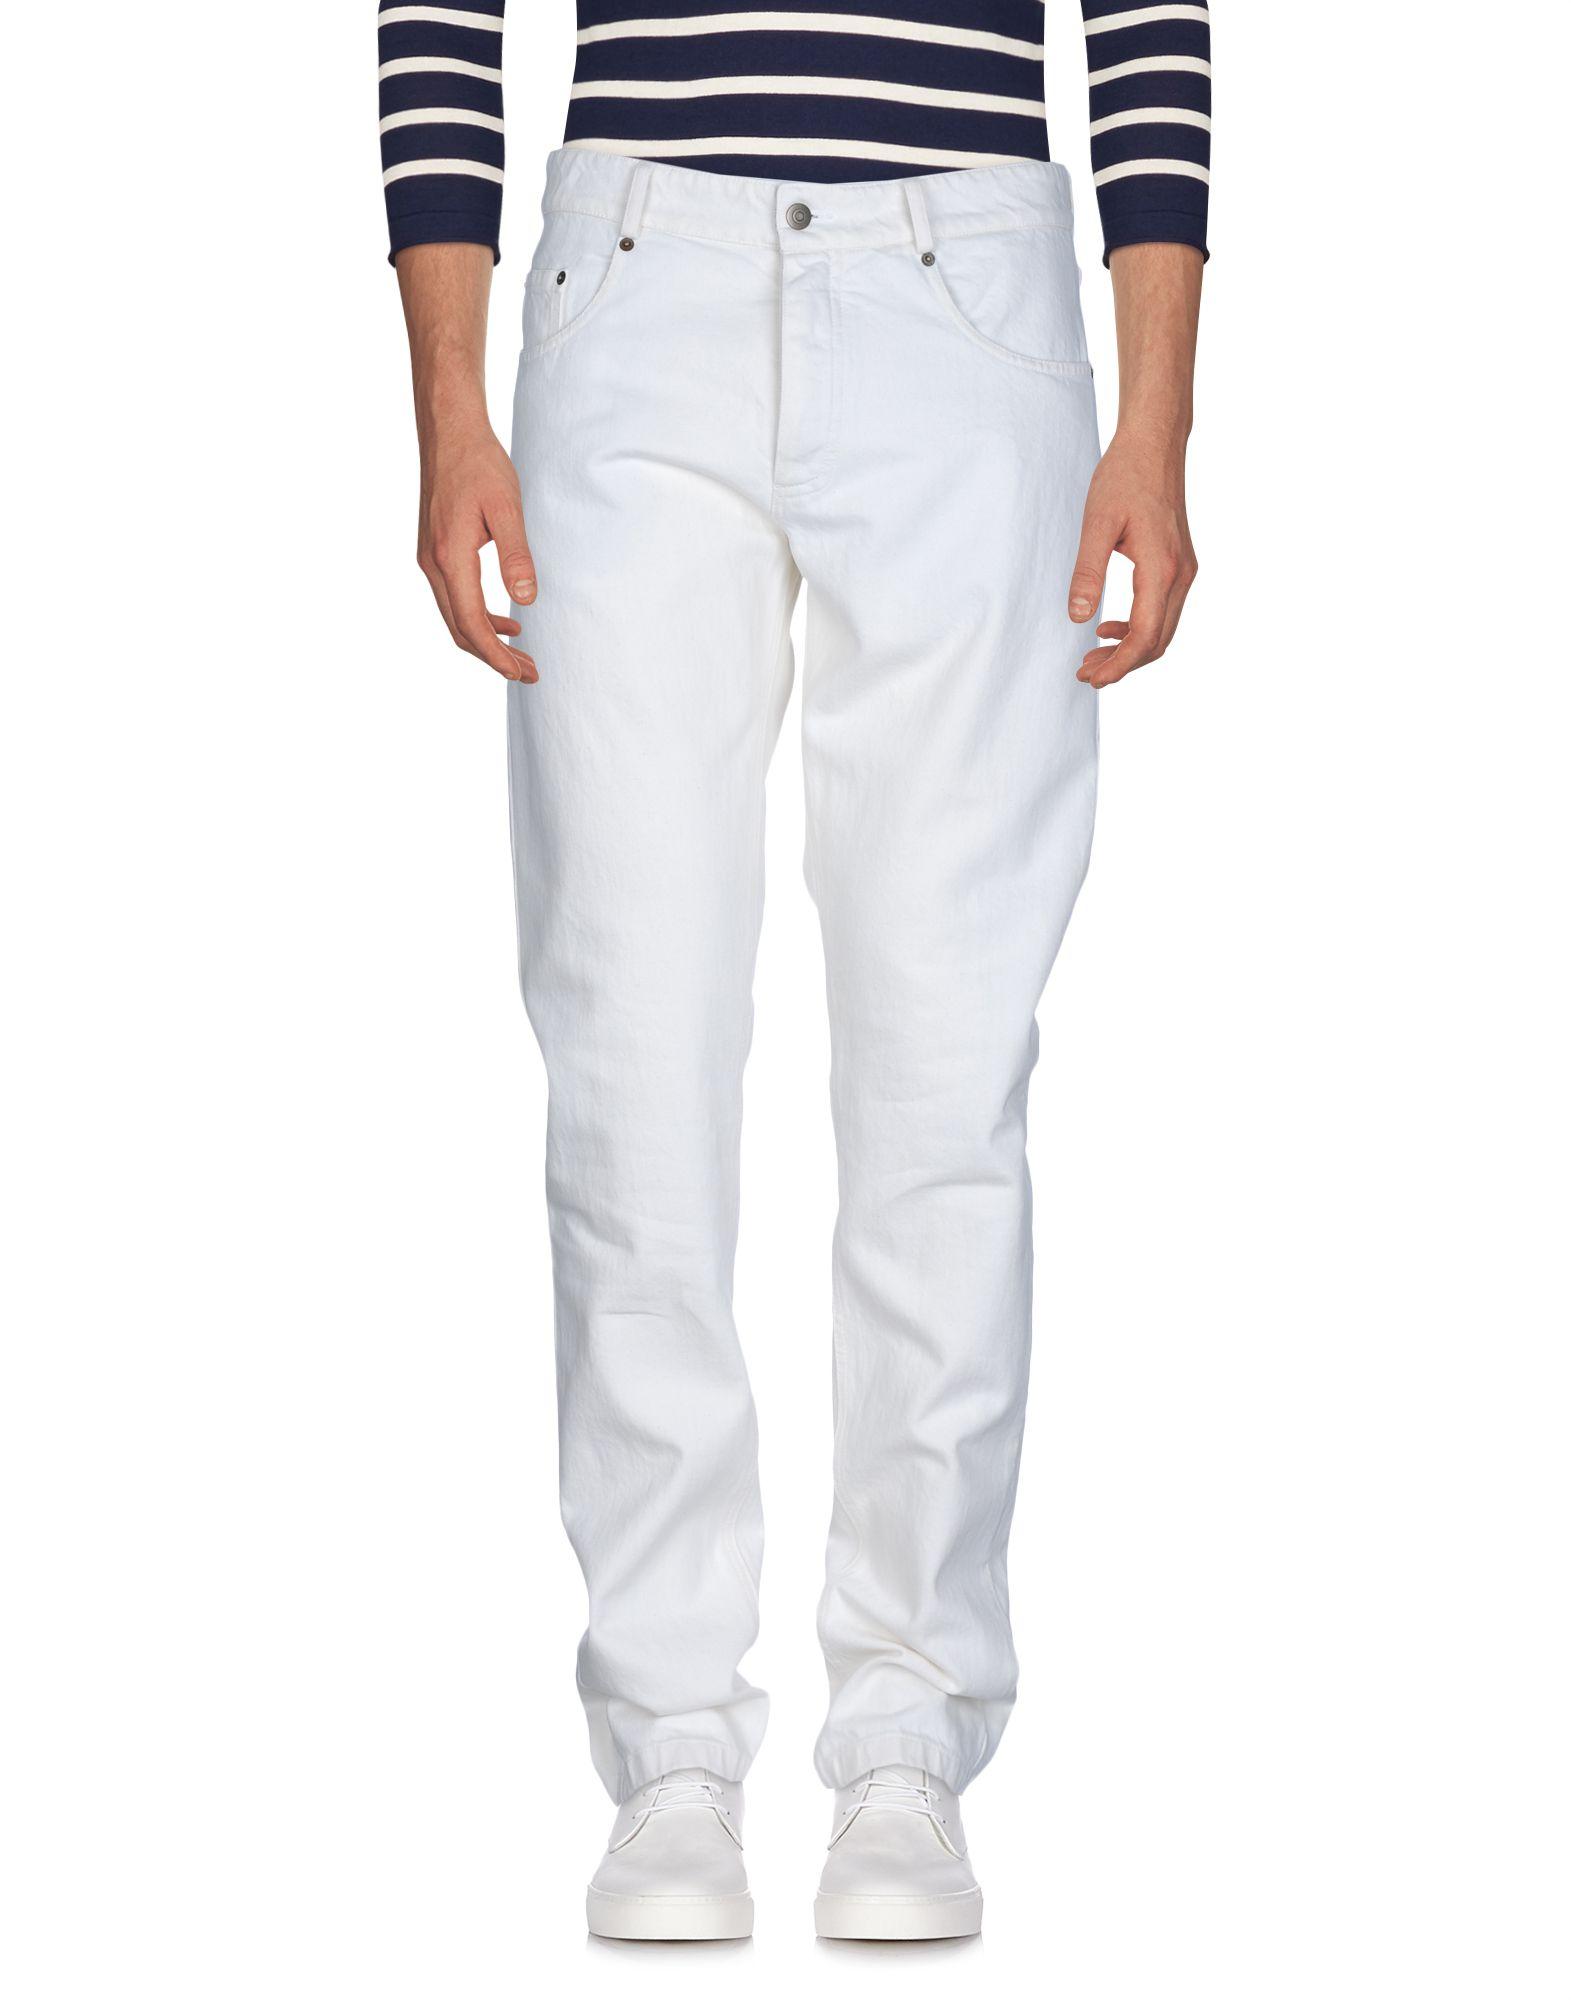 Pantaloni Jeans Missoni Uomo - Acquista online su